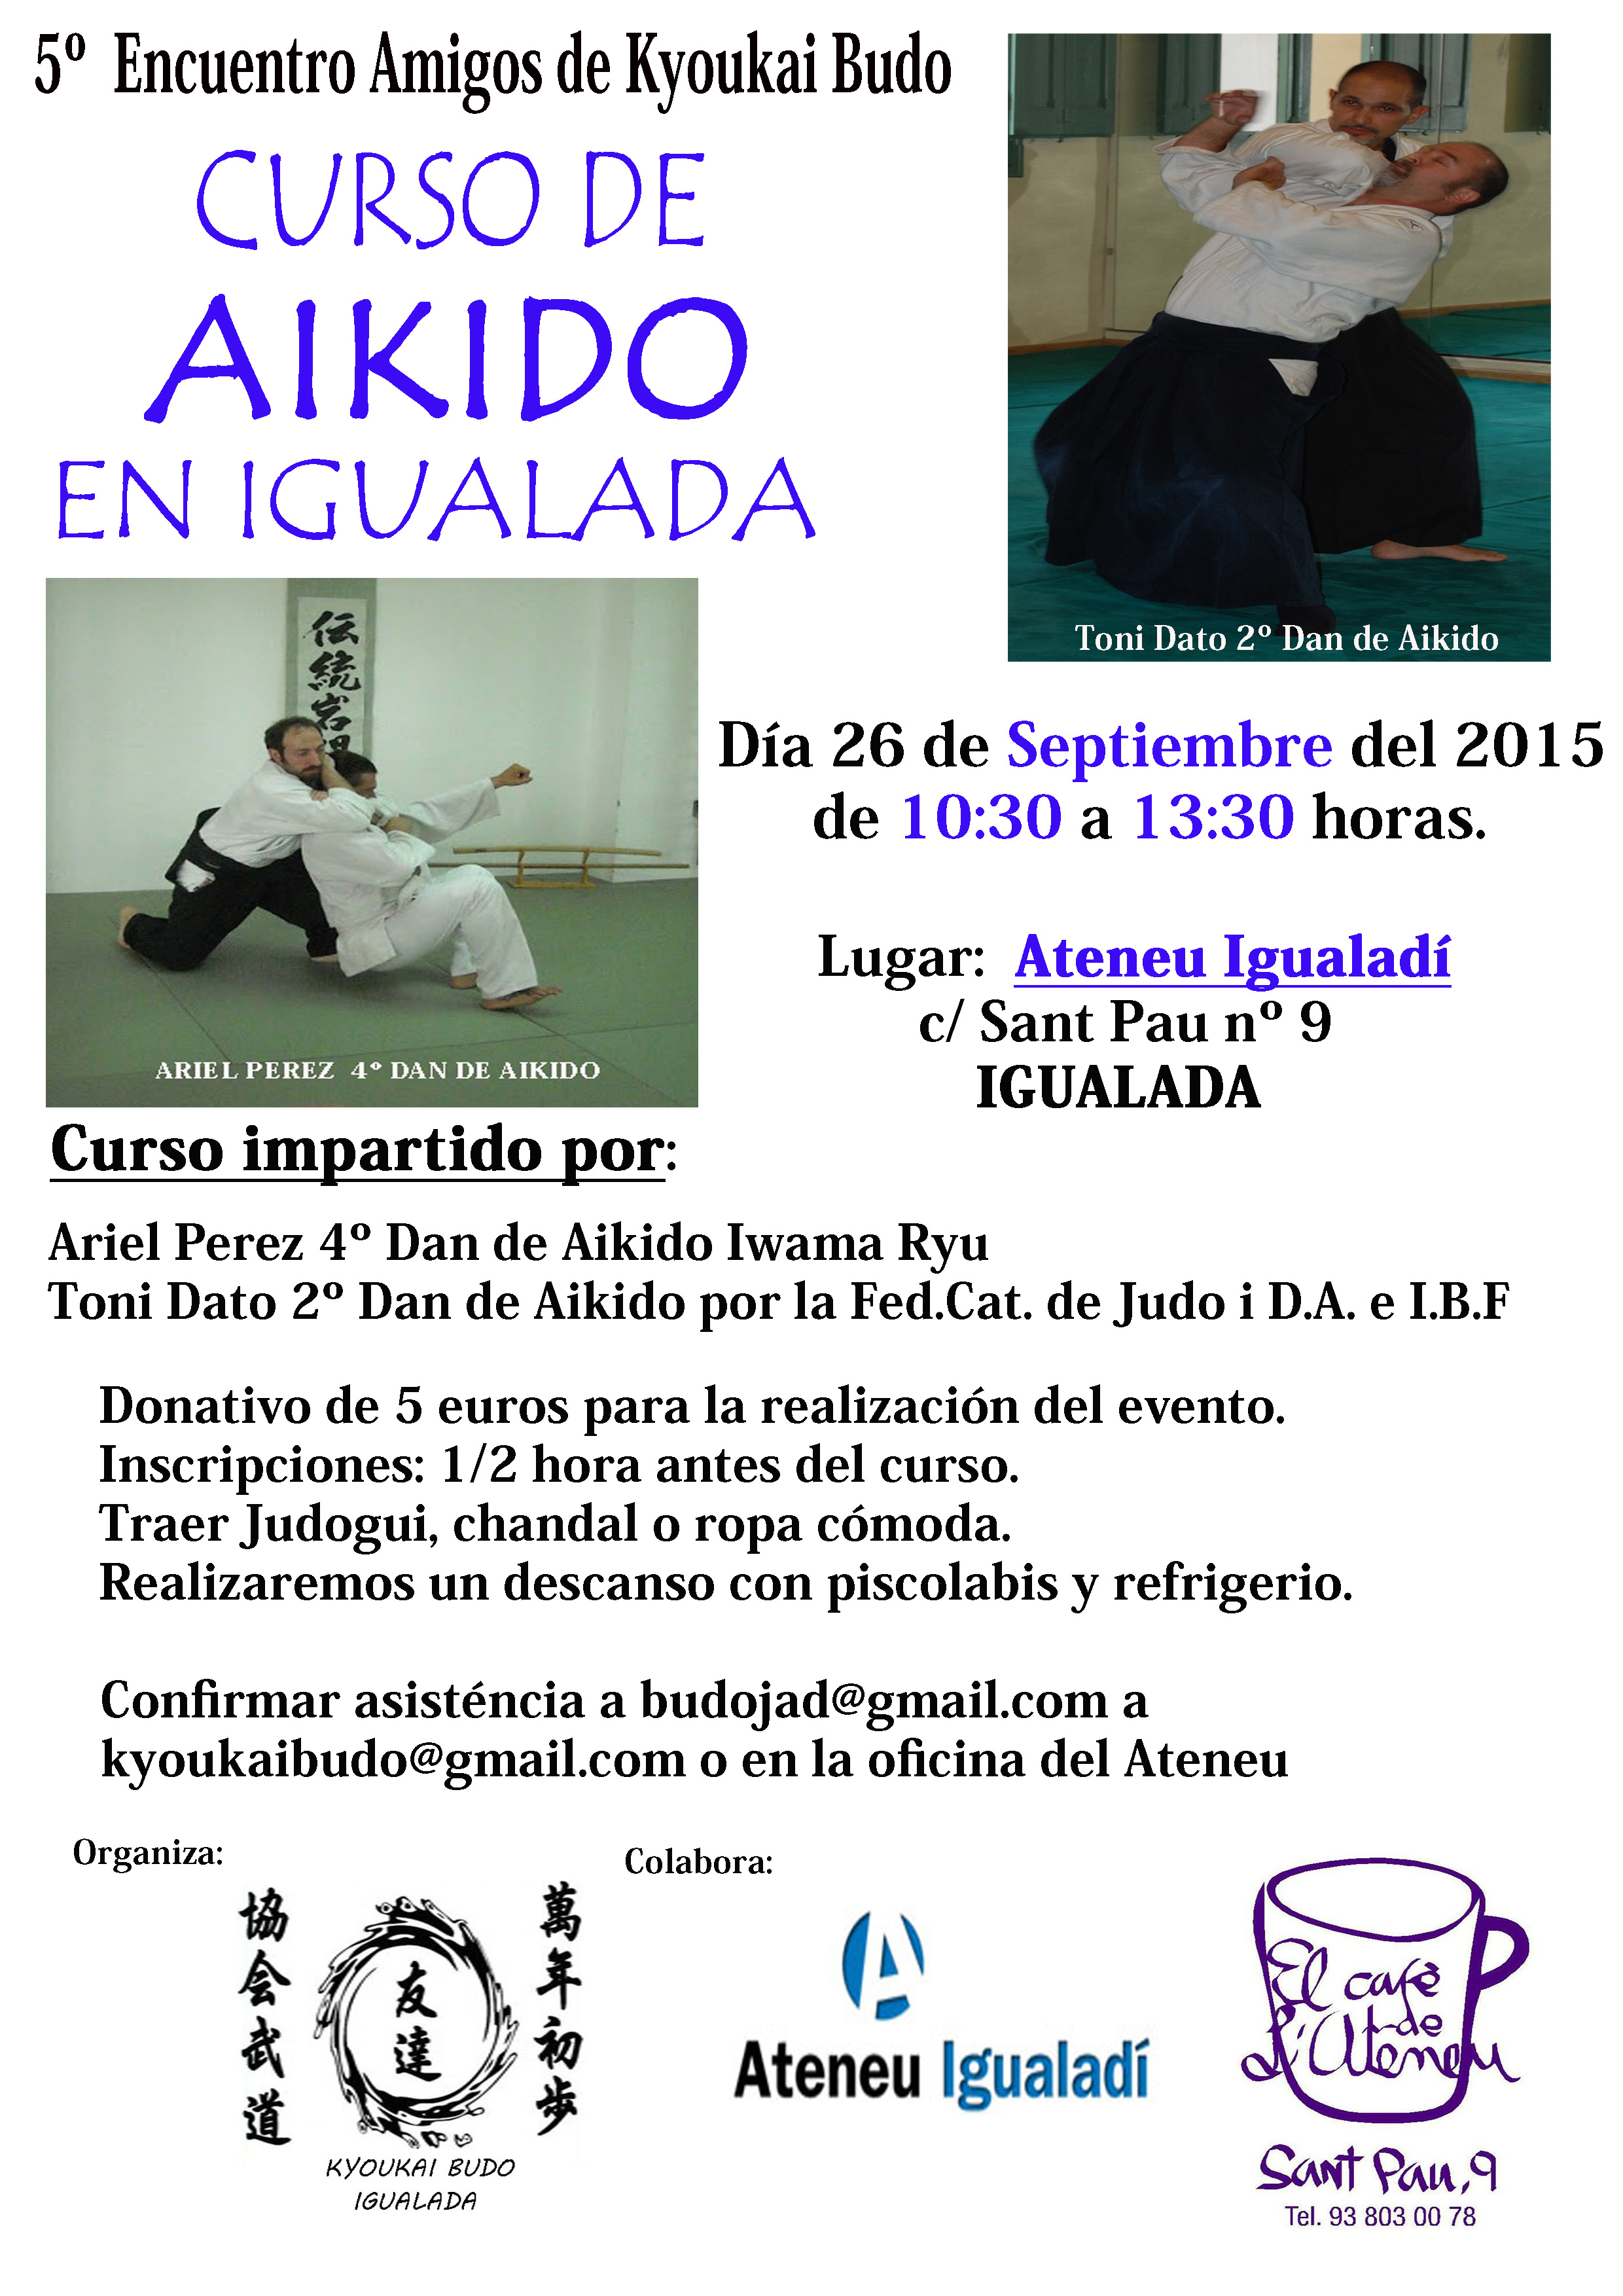 Curso Aikido Septiembre Igualada 2015 copia